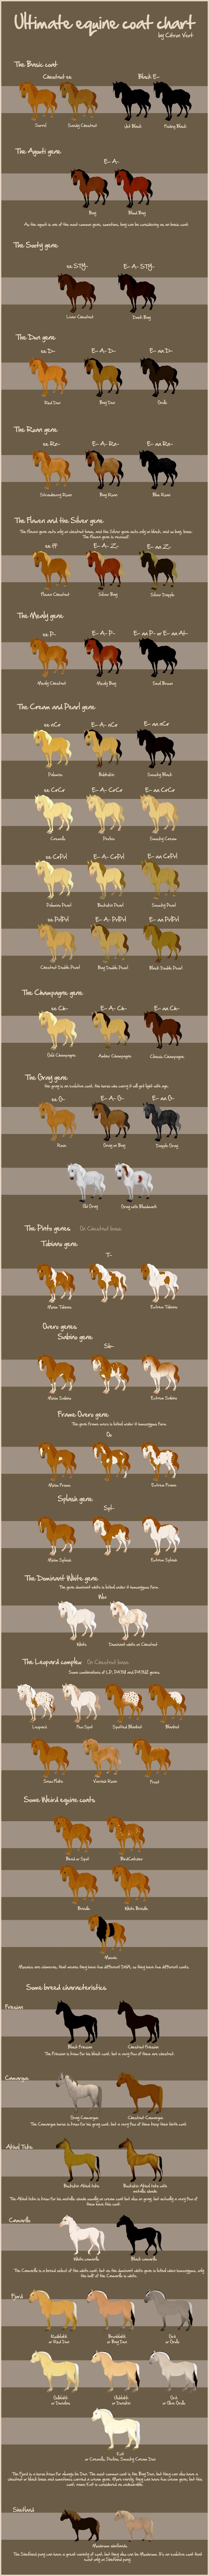 www.pegasebuzz.com | Les robes du cheval en anglais